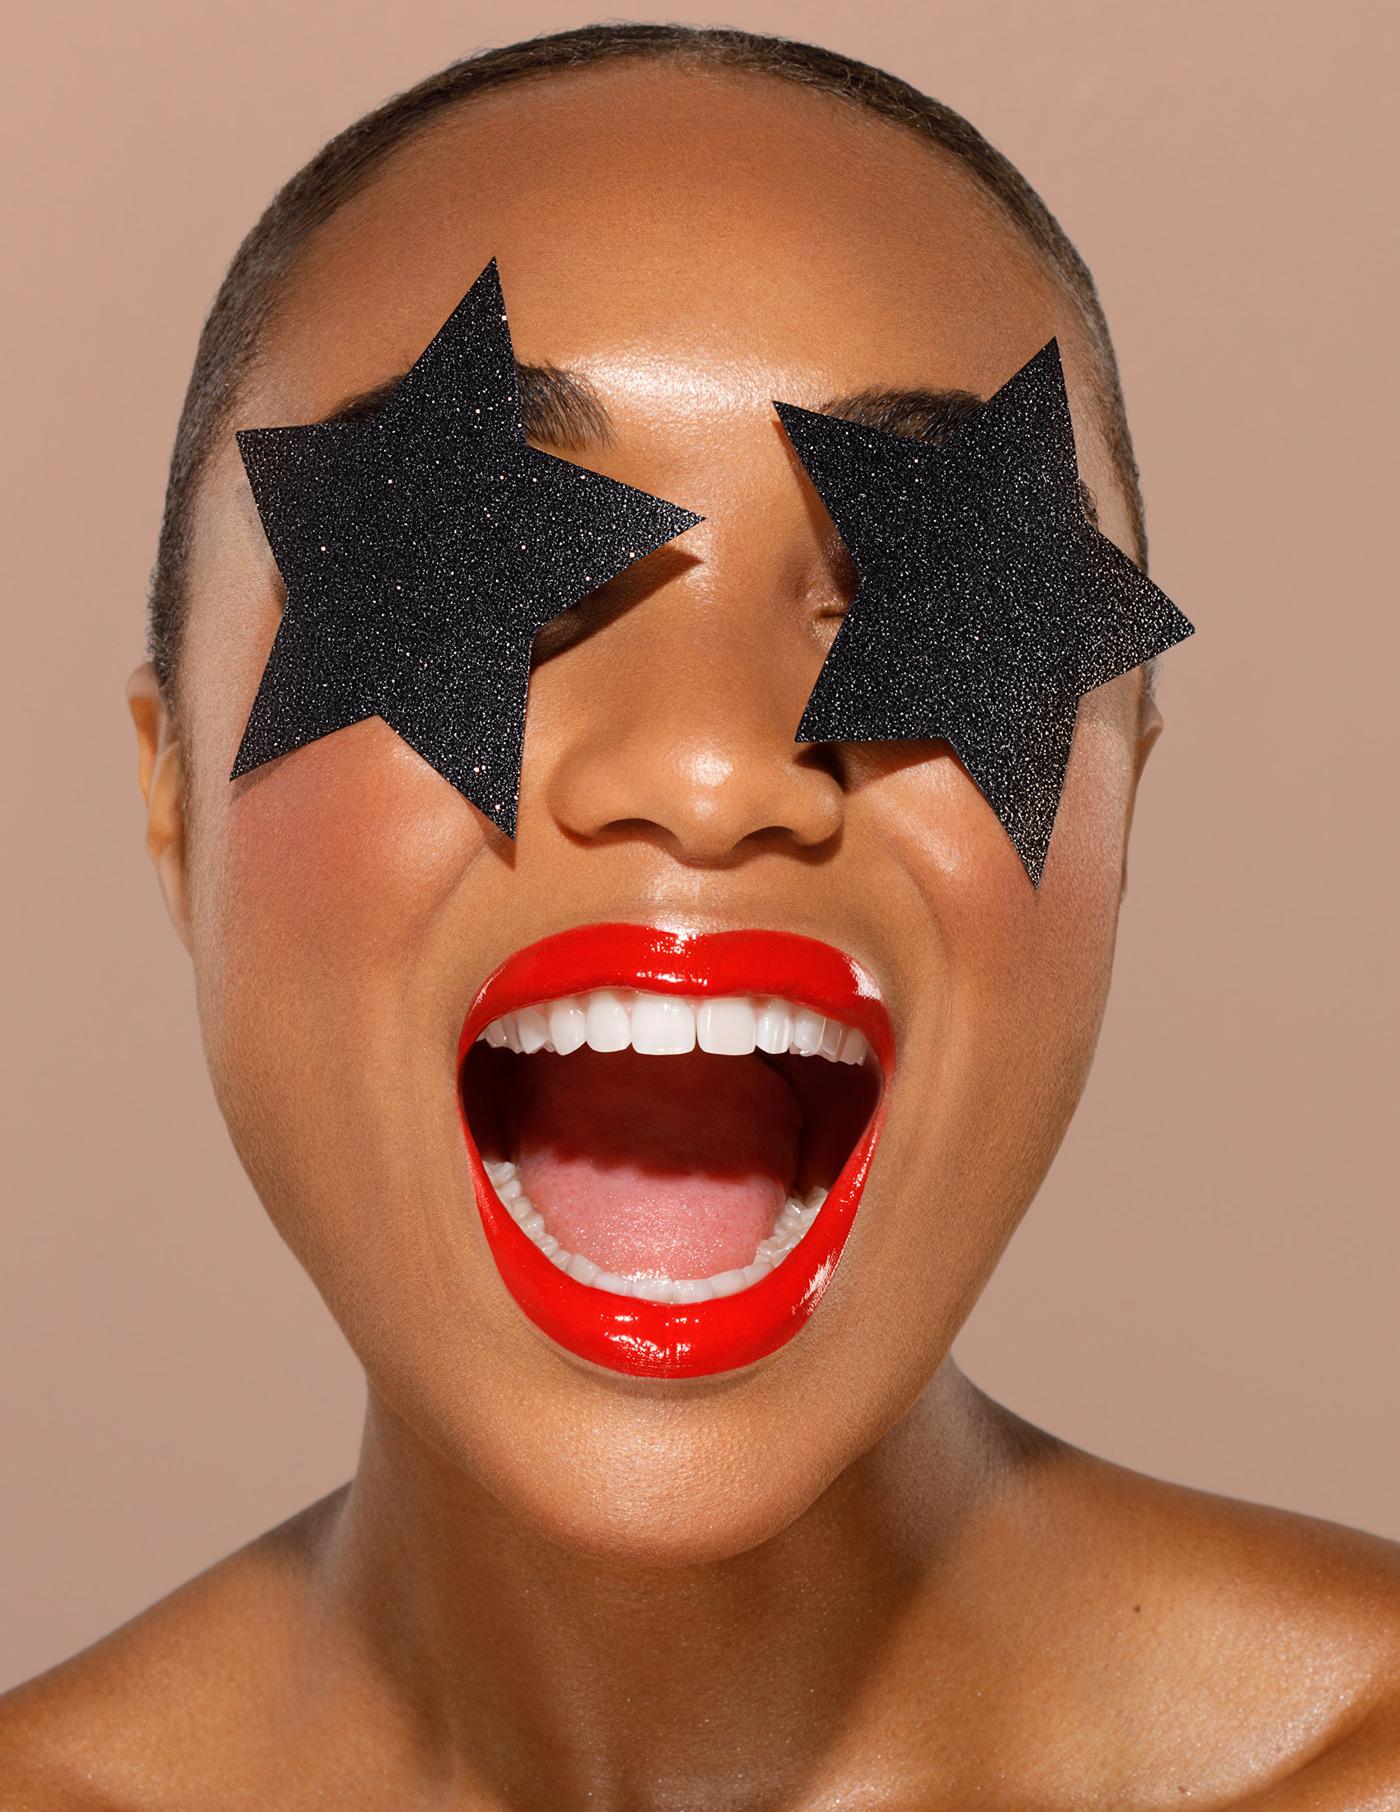 beauty conceptual editorial Emojis Fashion  makeup Mode Montreal portrait